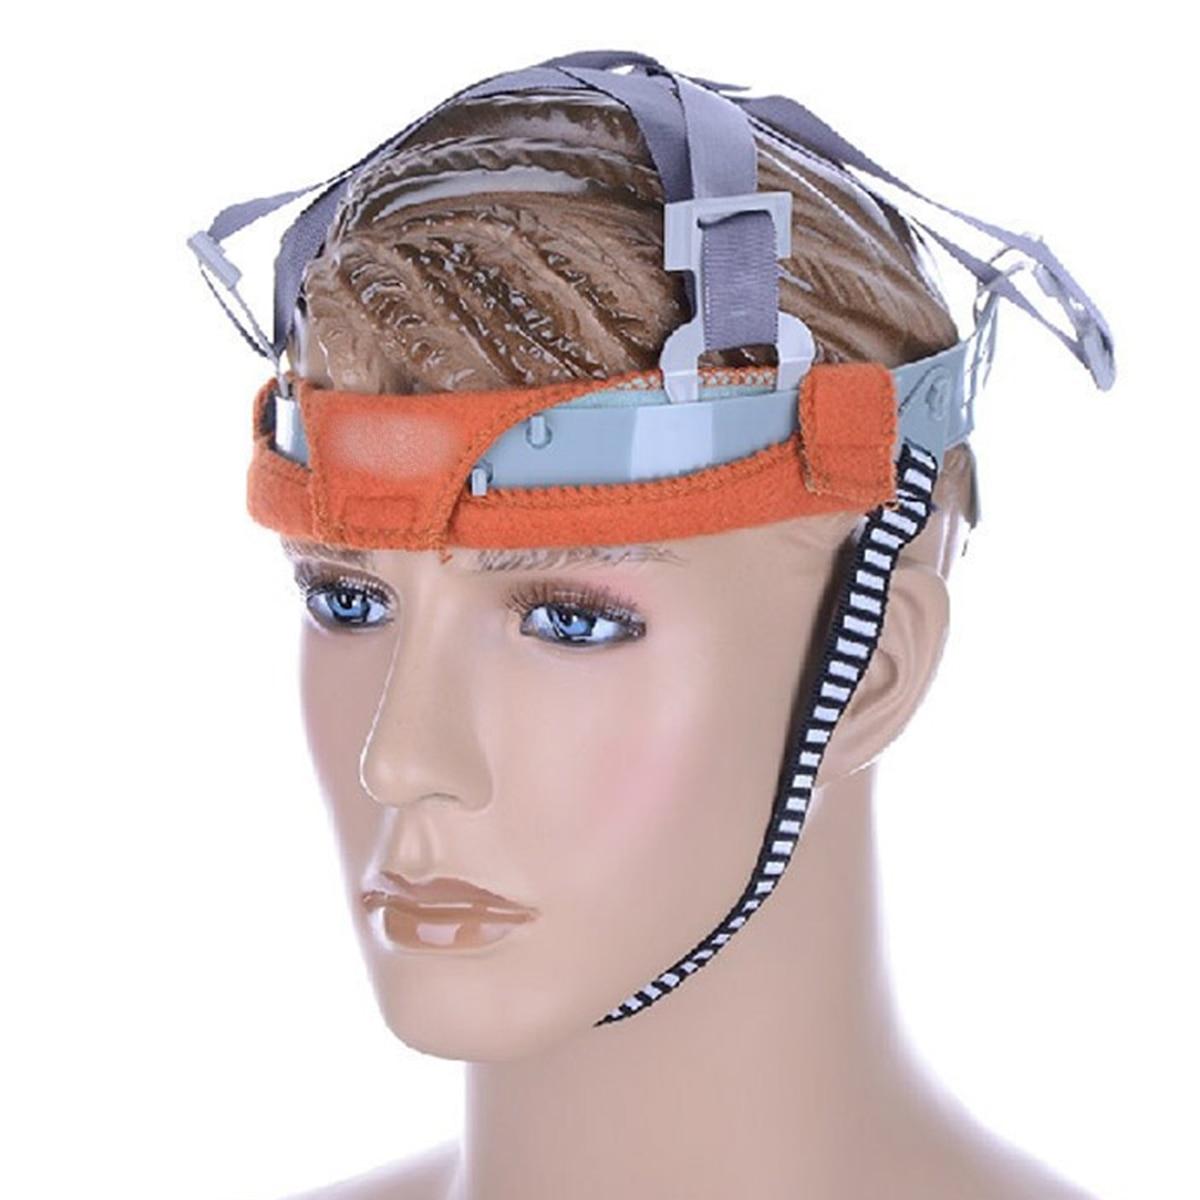 2pcs Helmet Sweatband For Hard Hat Safety Helmet Welding Helmet Sweatband Sweat Band Helmet Sweatbands